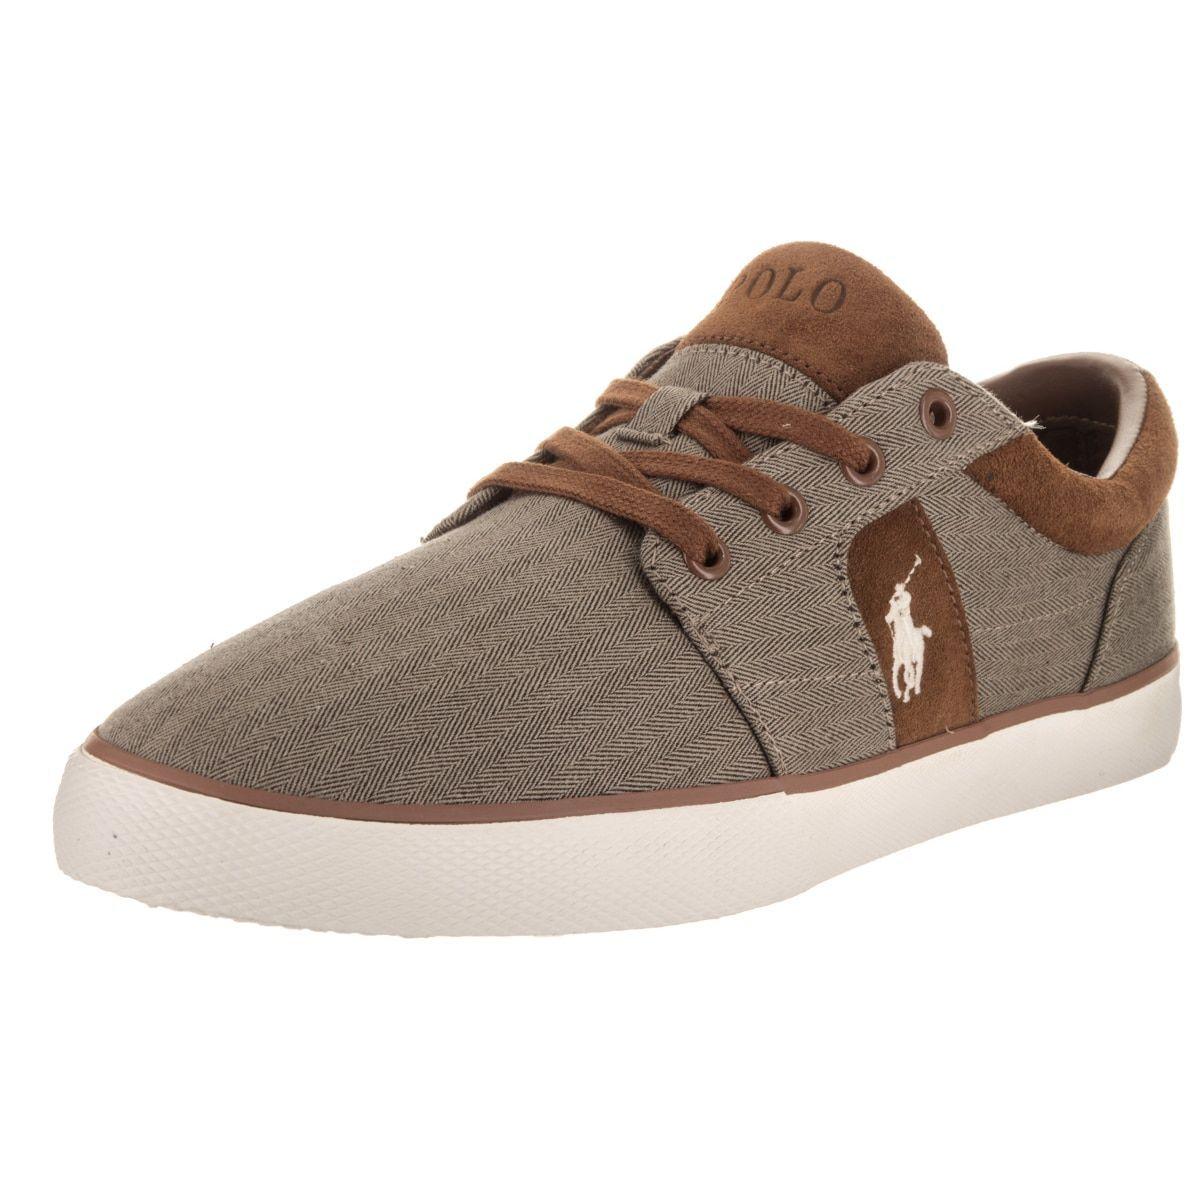 Polo Ralph Lauren Men's Halmore II Sk Vlc Casual Shoes